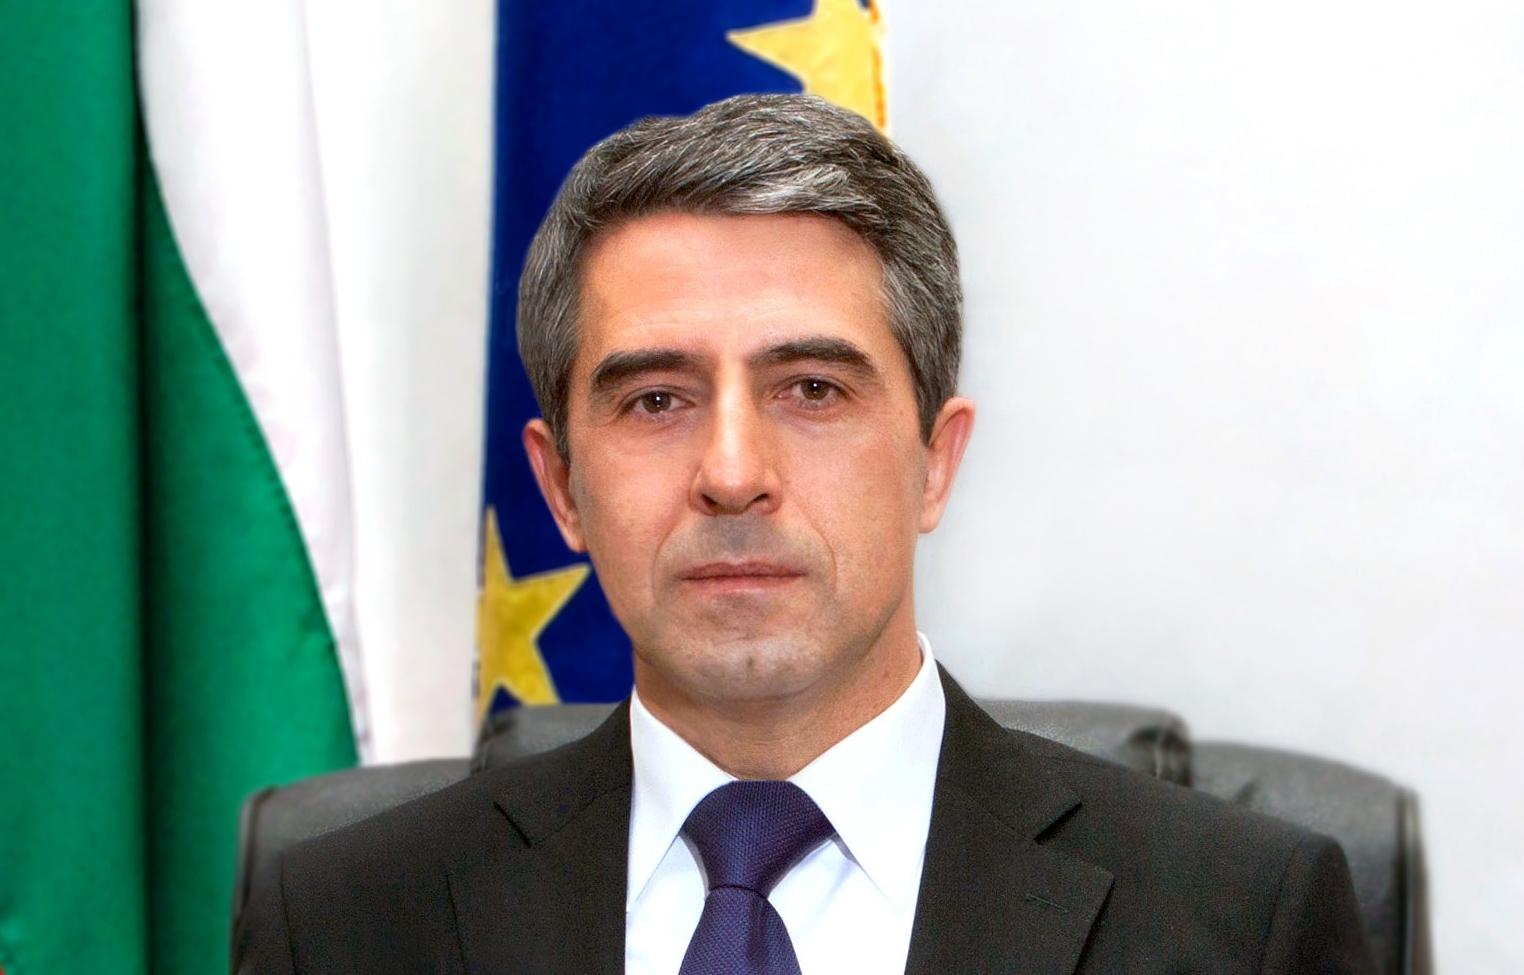 No sign that Bulgarians exploit UK social system, President Plevneliev says